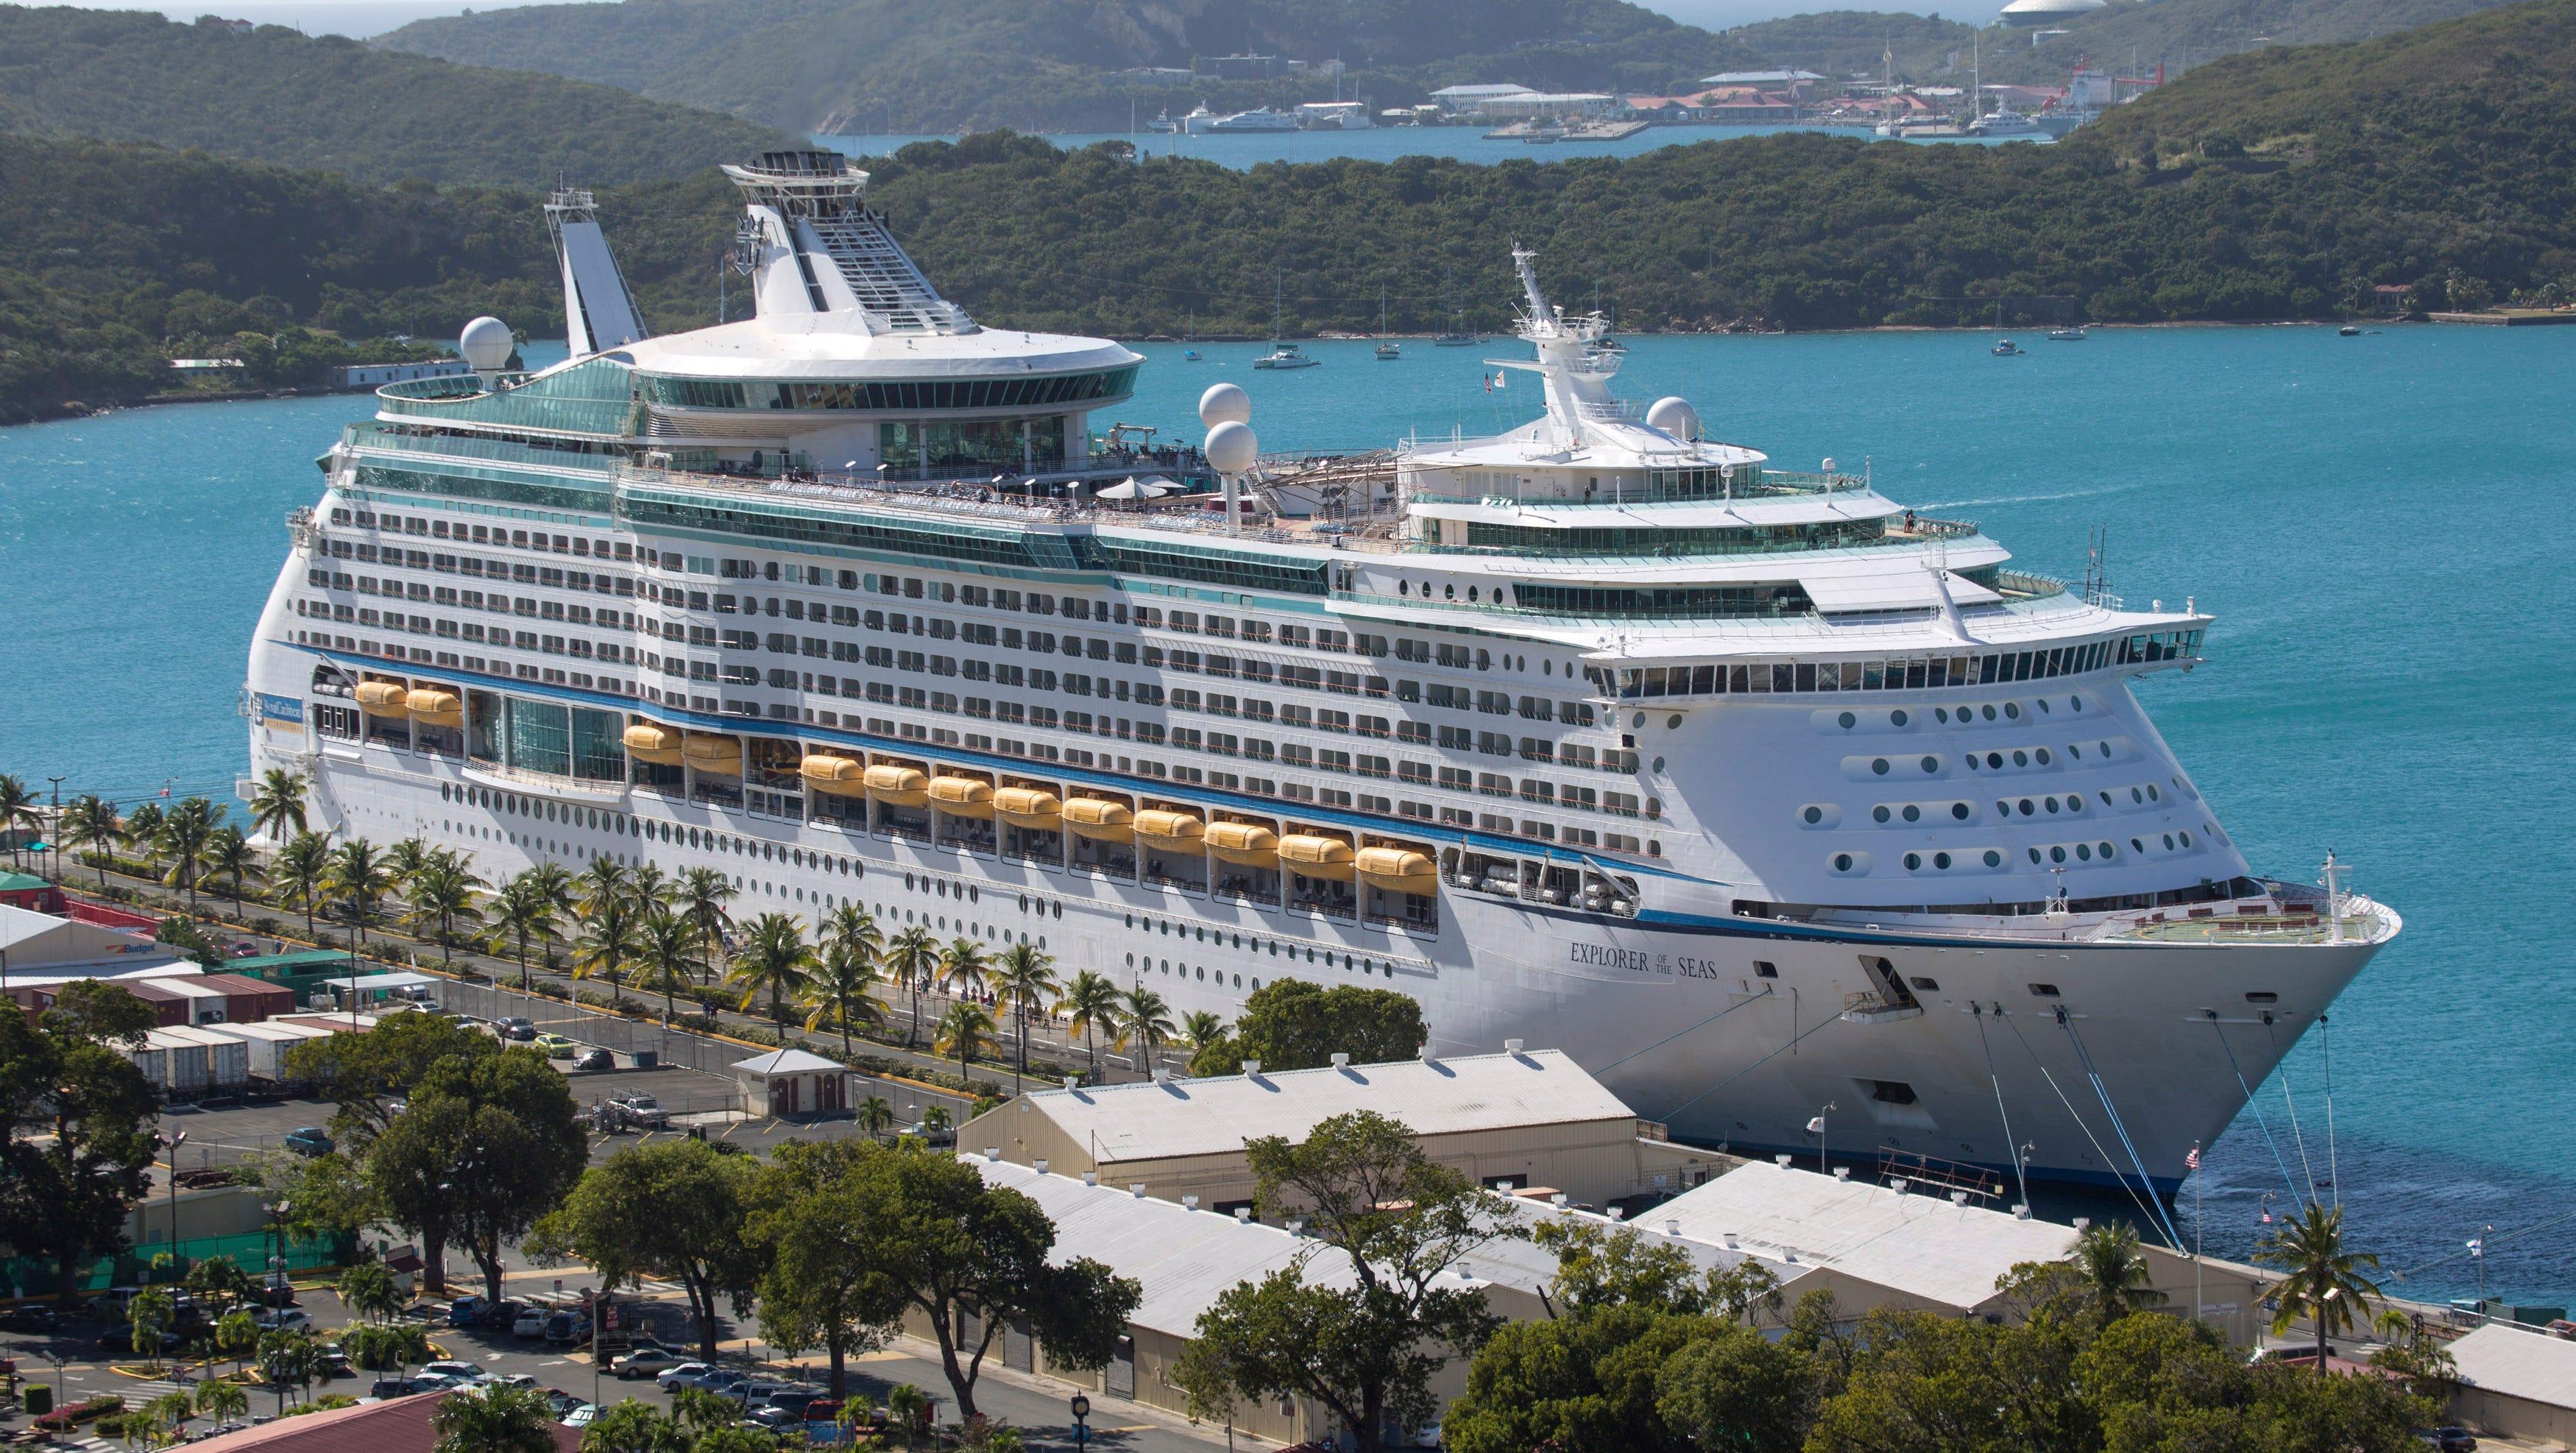 carnival cruise norovirus outbreak